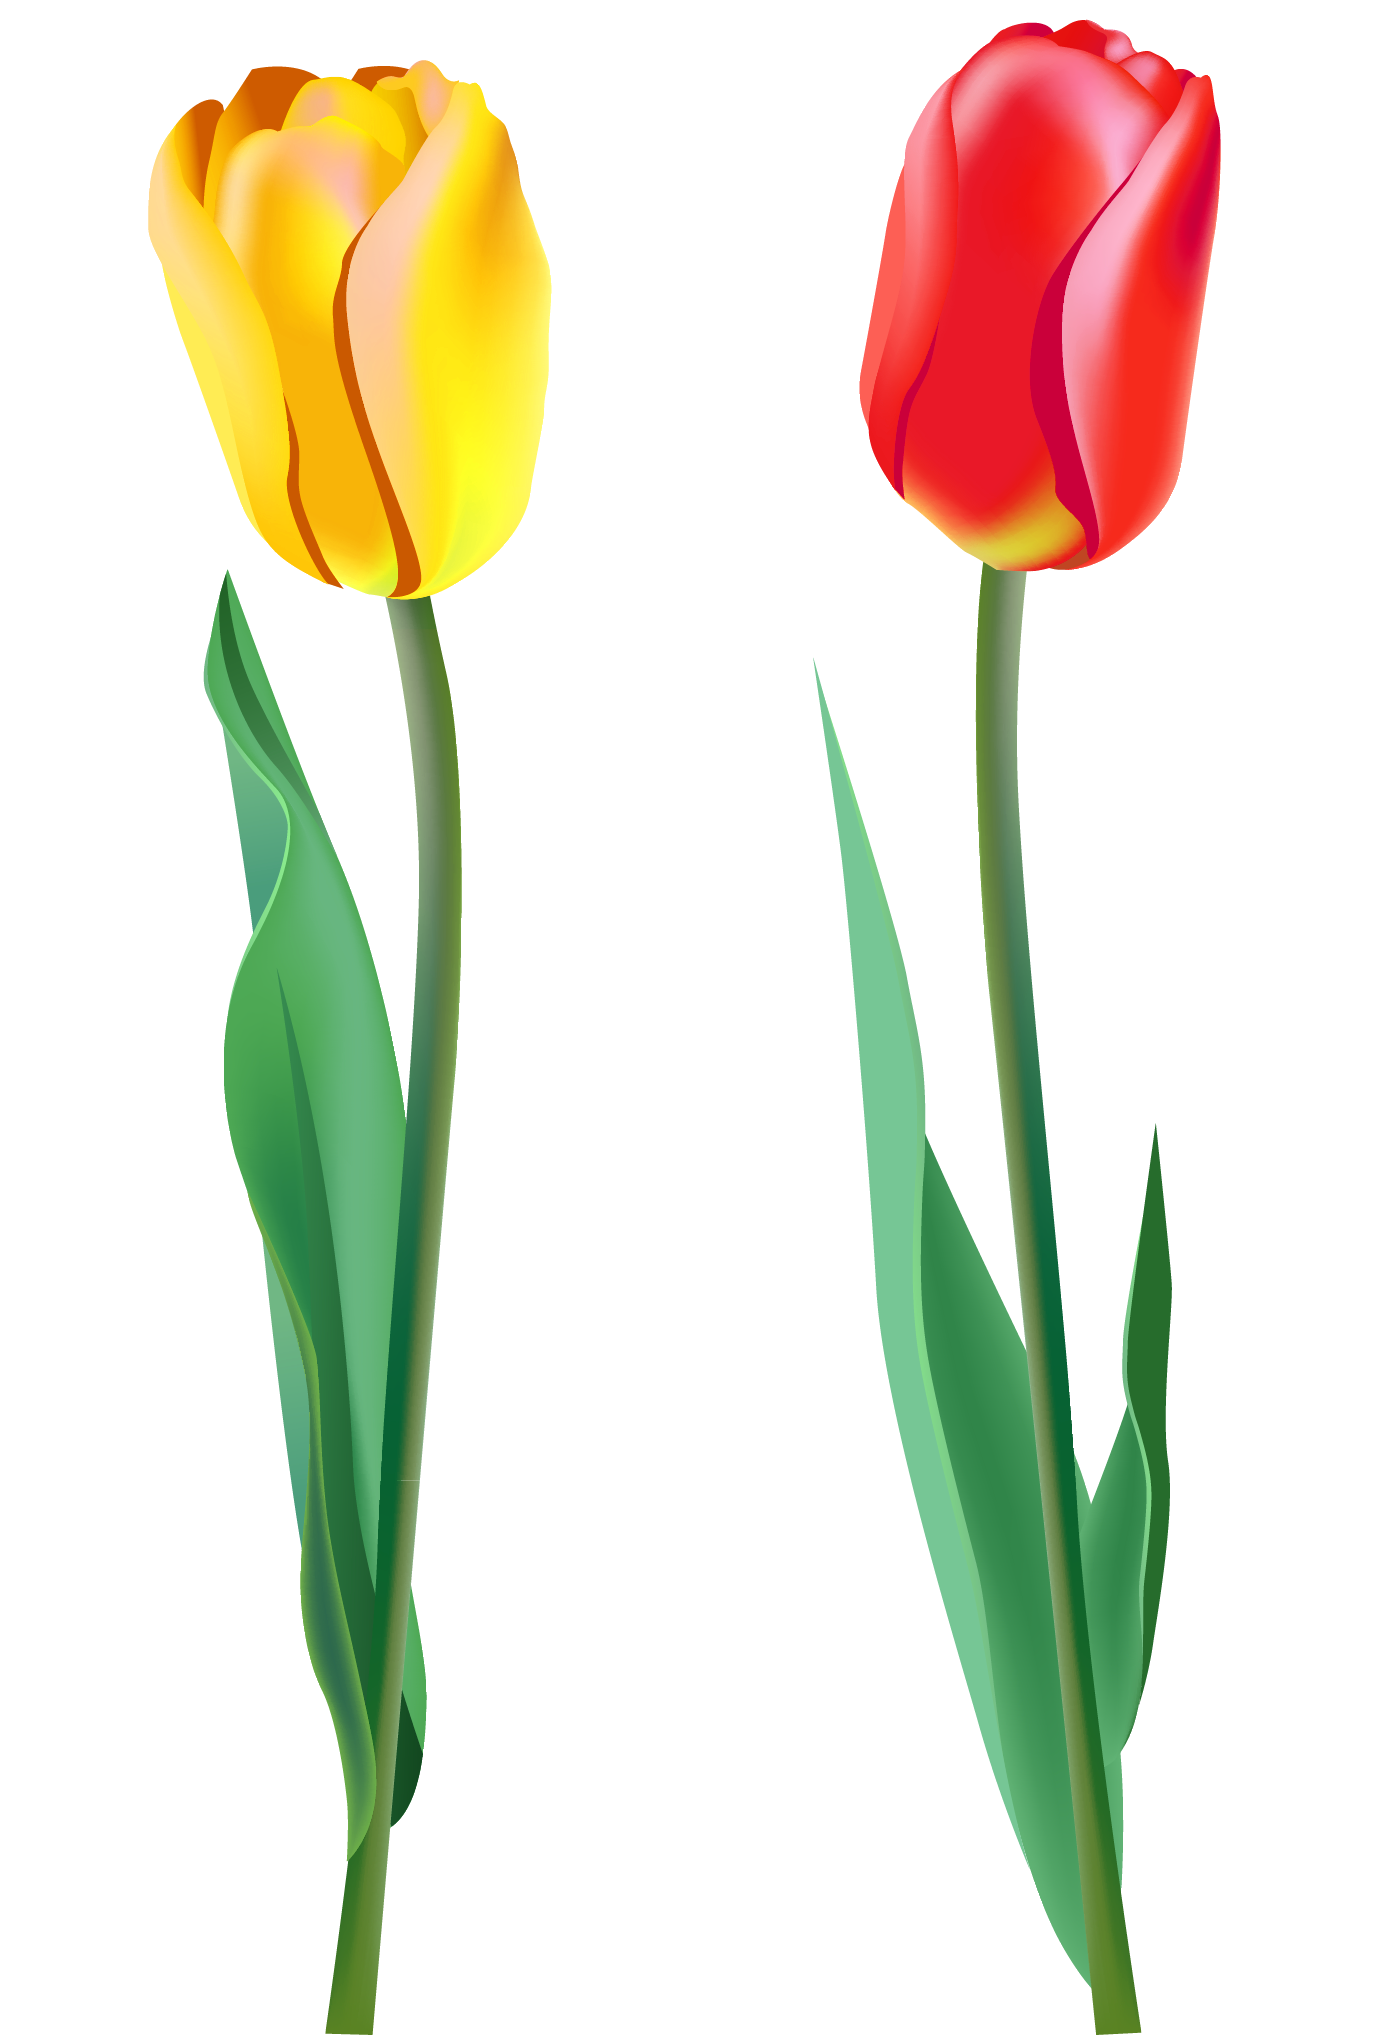 Tulip PNG image - Tulip PNG